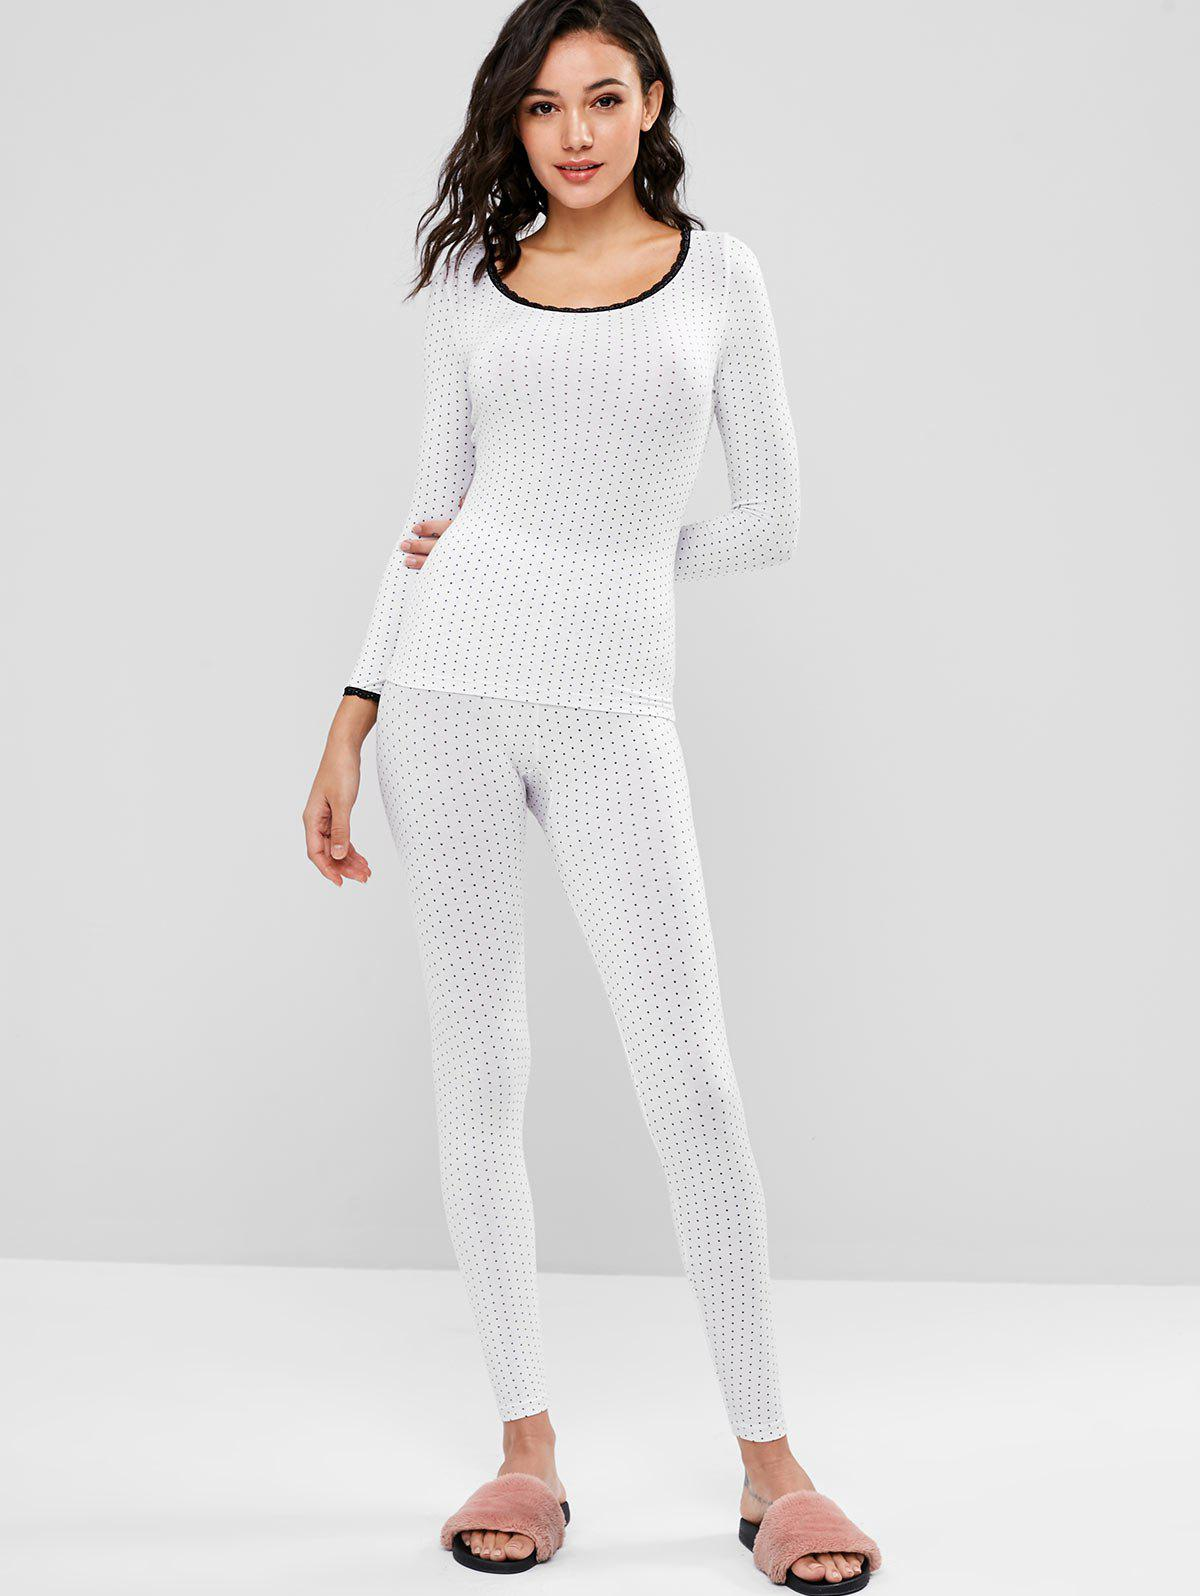 Printed Long Underwear Thermal Top and Pants Set 278597202